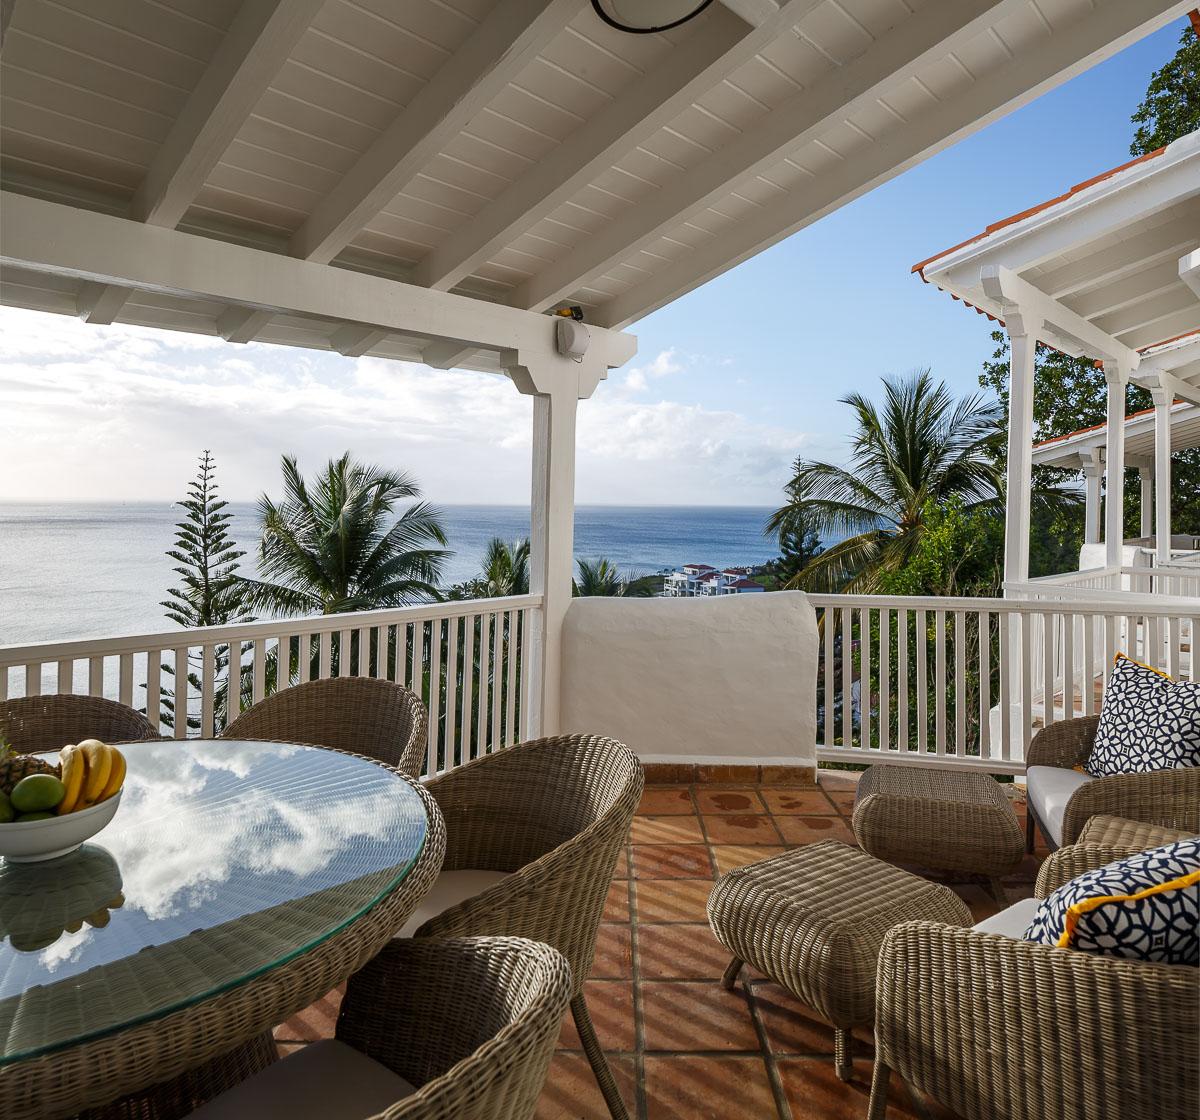 17-Beach Villa 33.jpg